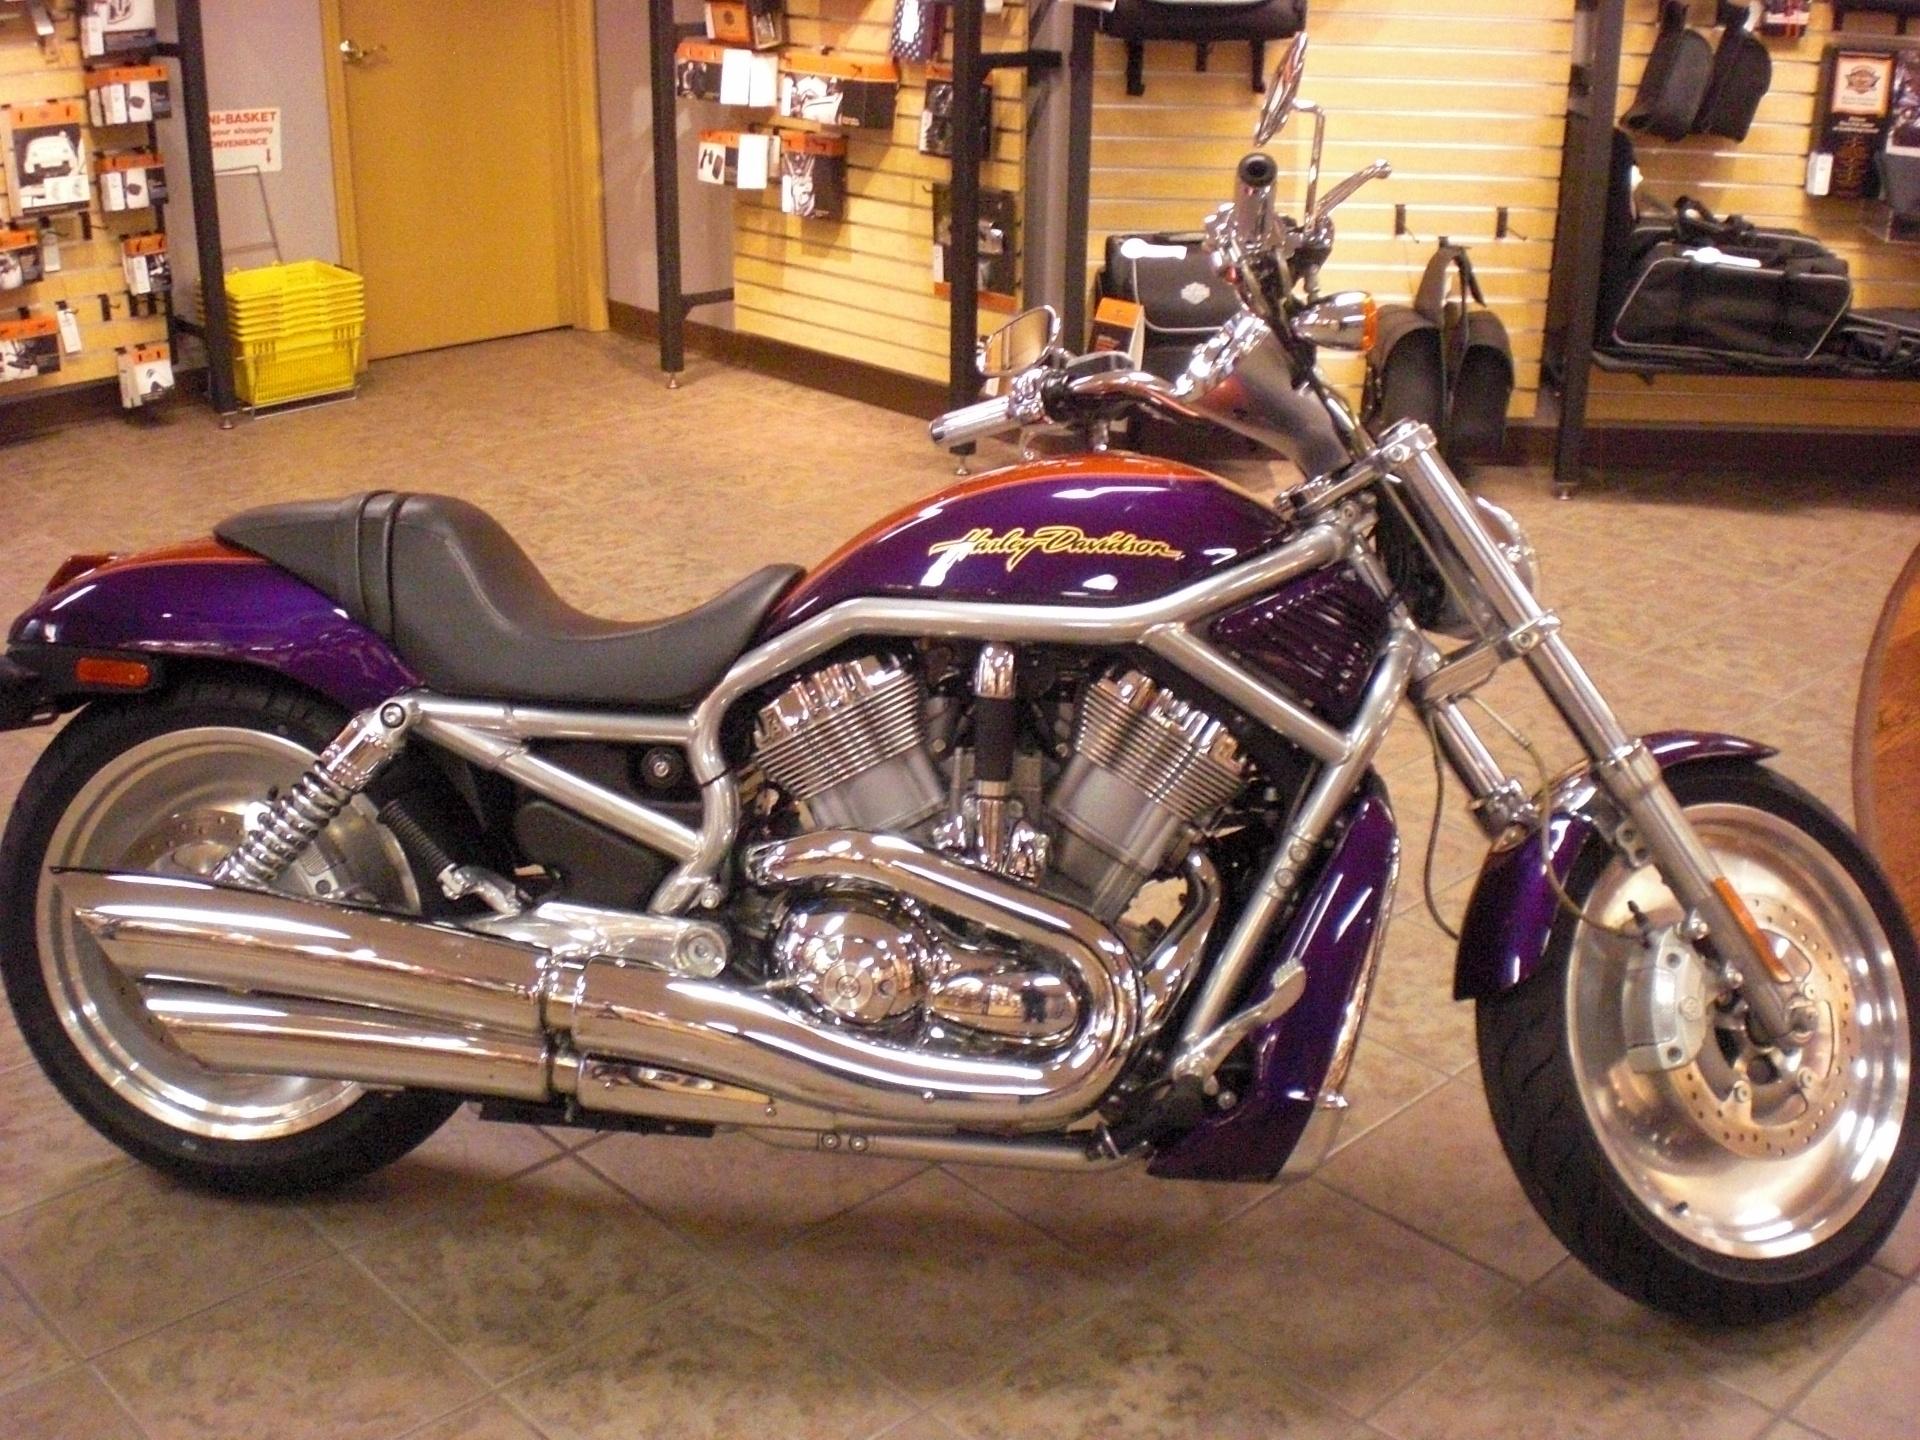 2006 Harley-Davidson V-Rod® in Fort Wayne, Indiana